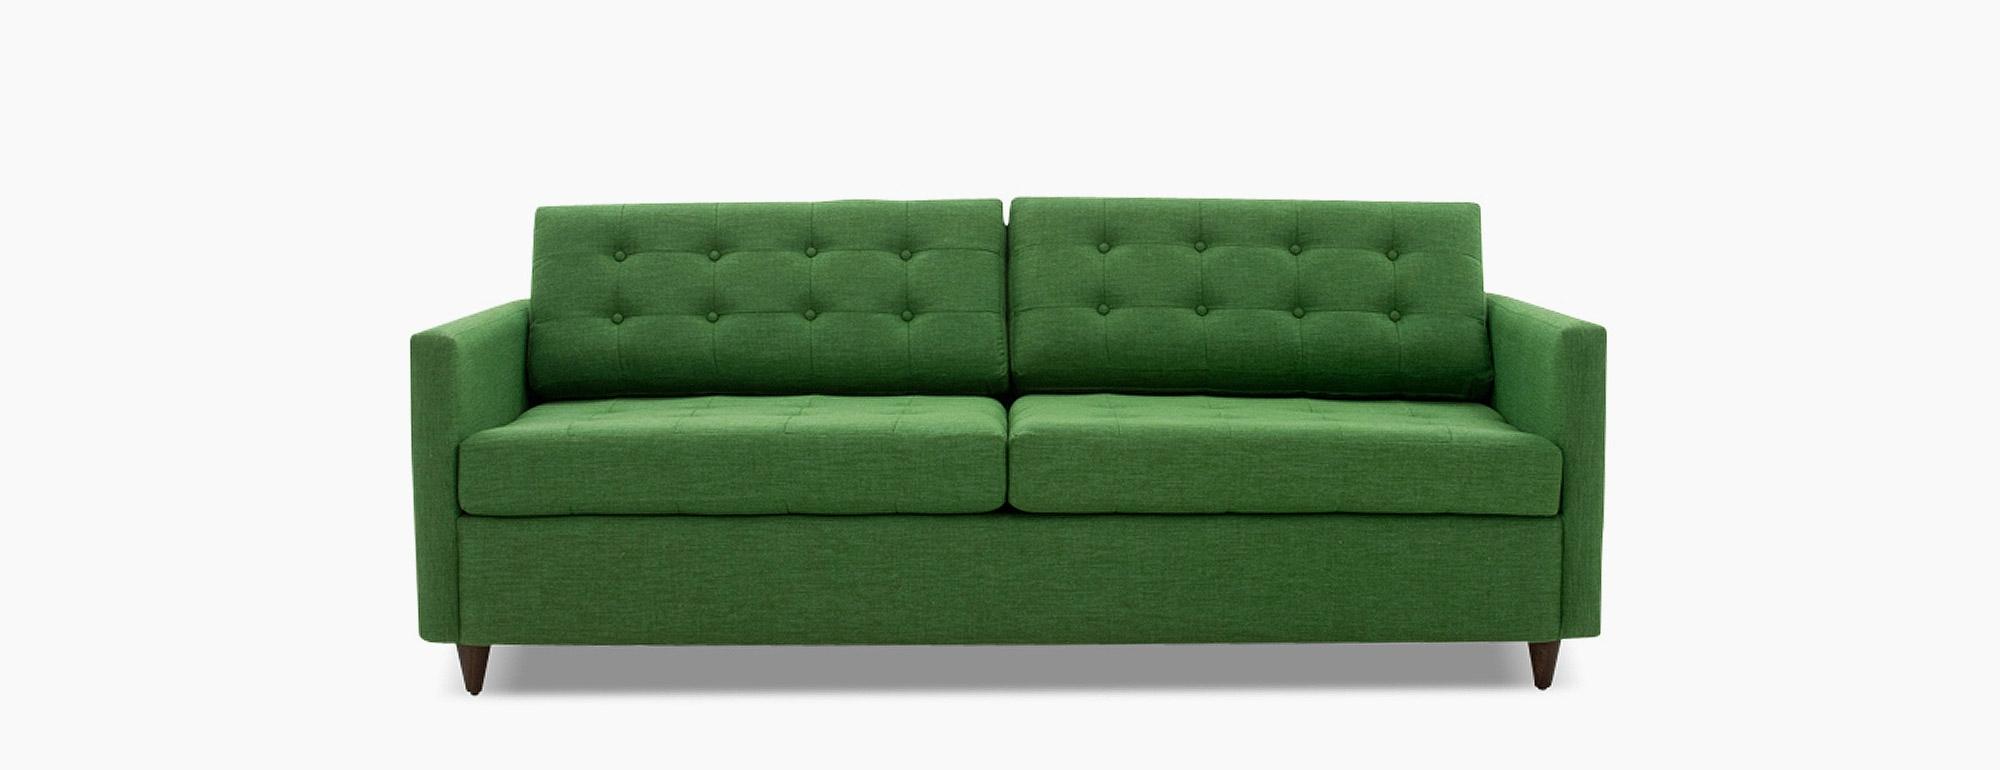 Delightful Inspiration About Eliot Sleeper Sofa Joybird Inside Elliott Sofa (#6 Of 12)